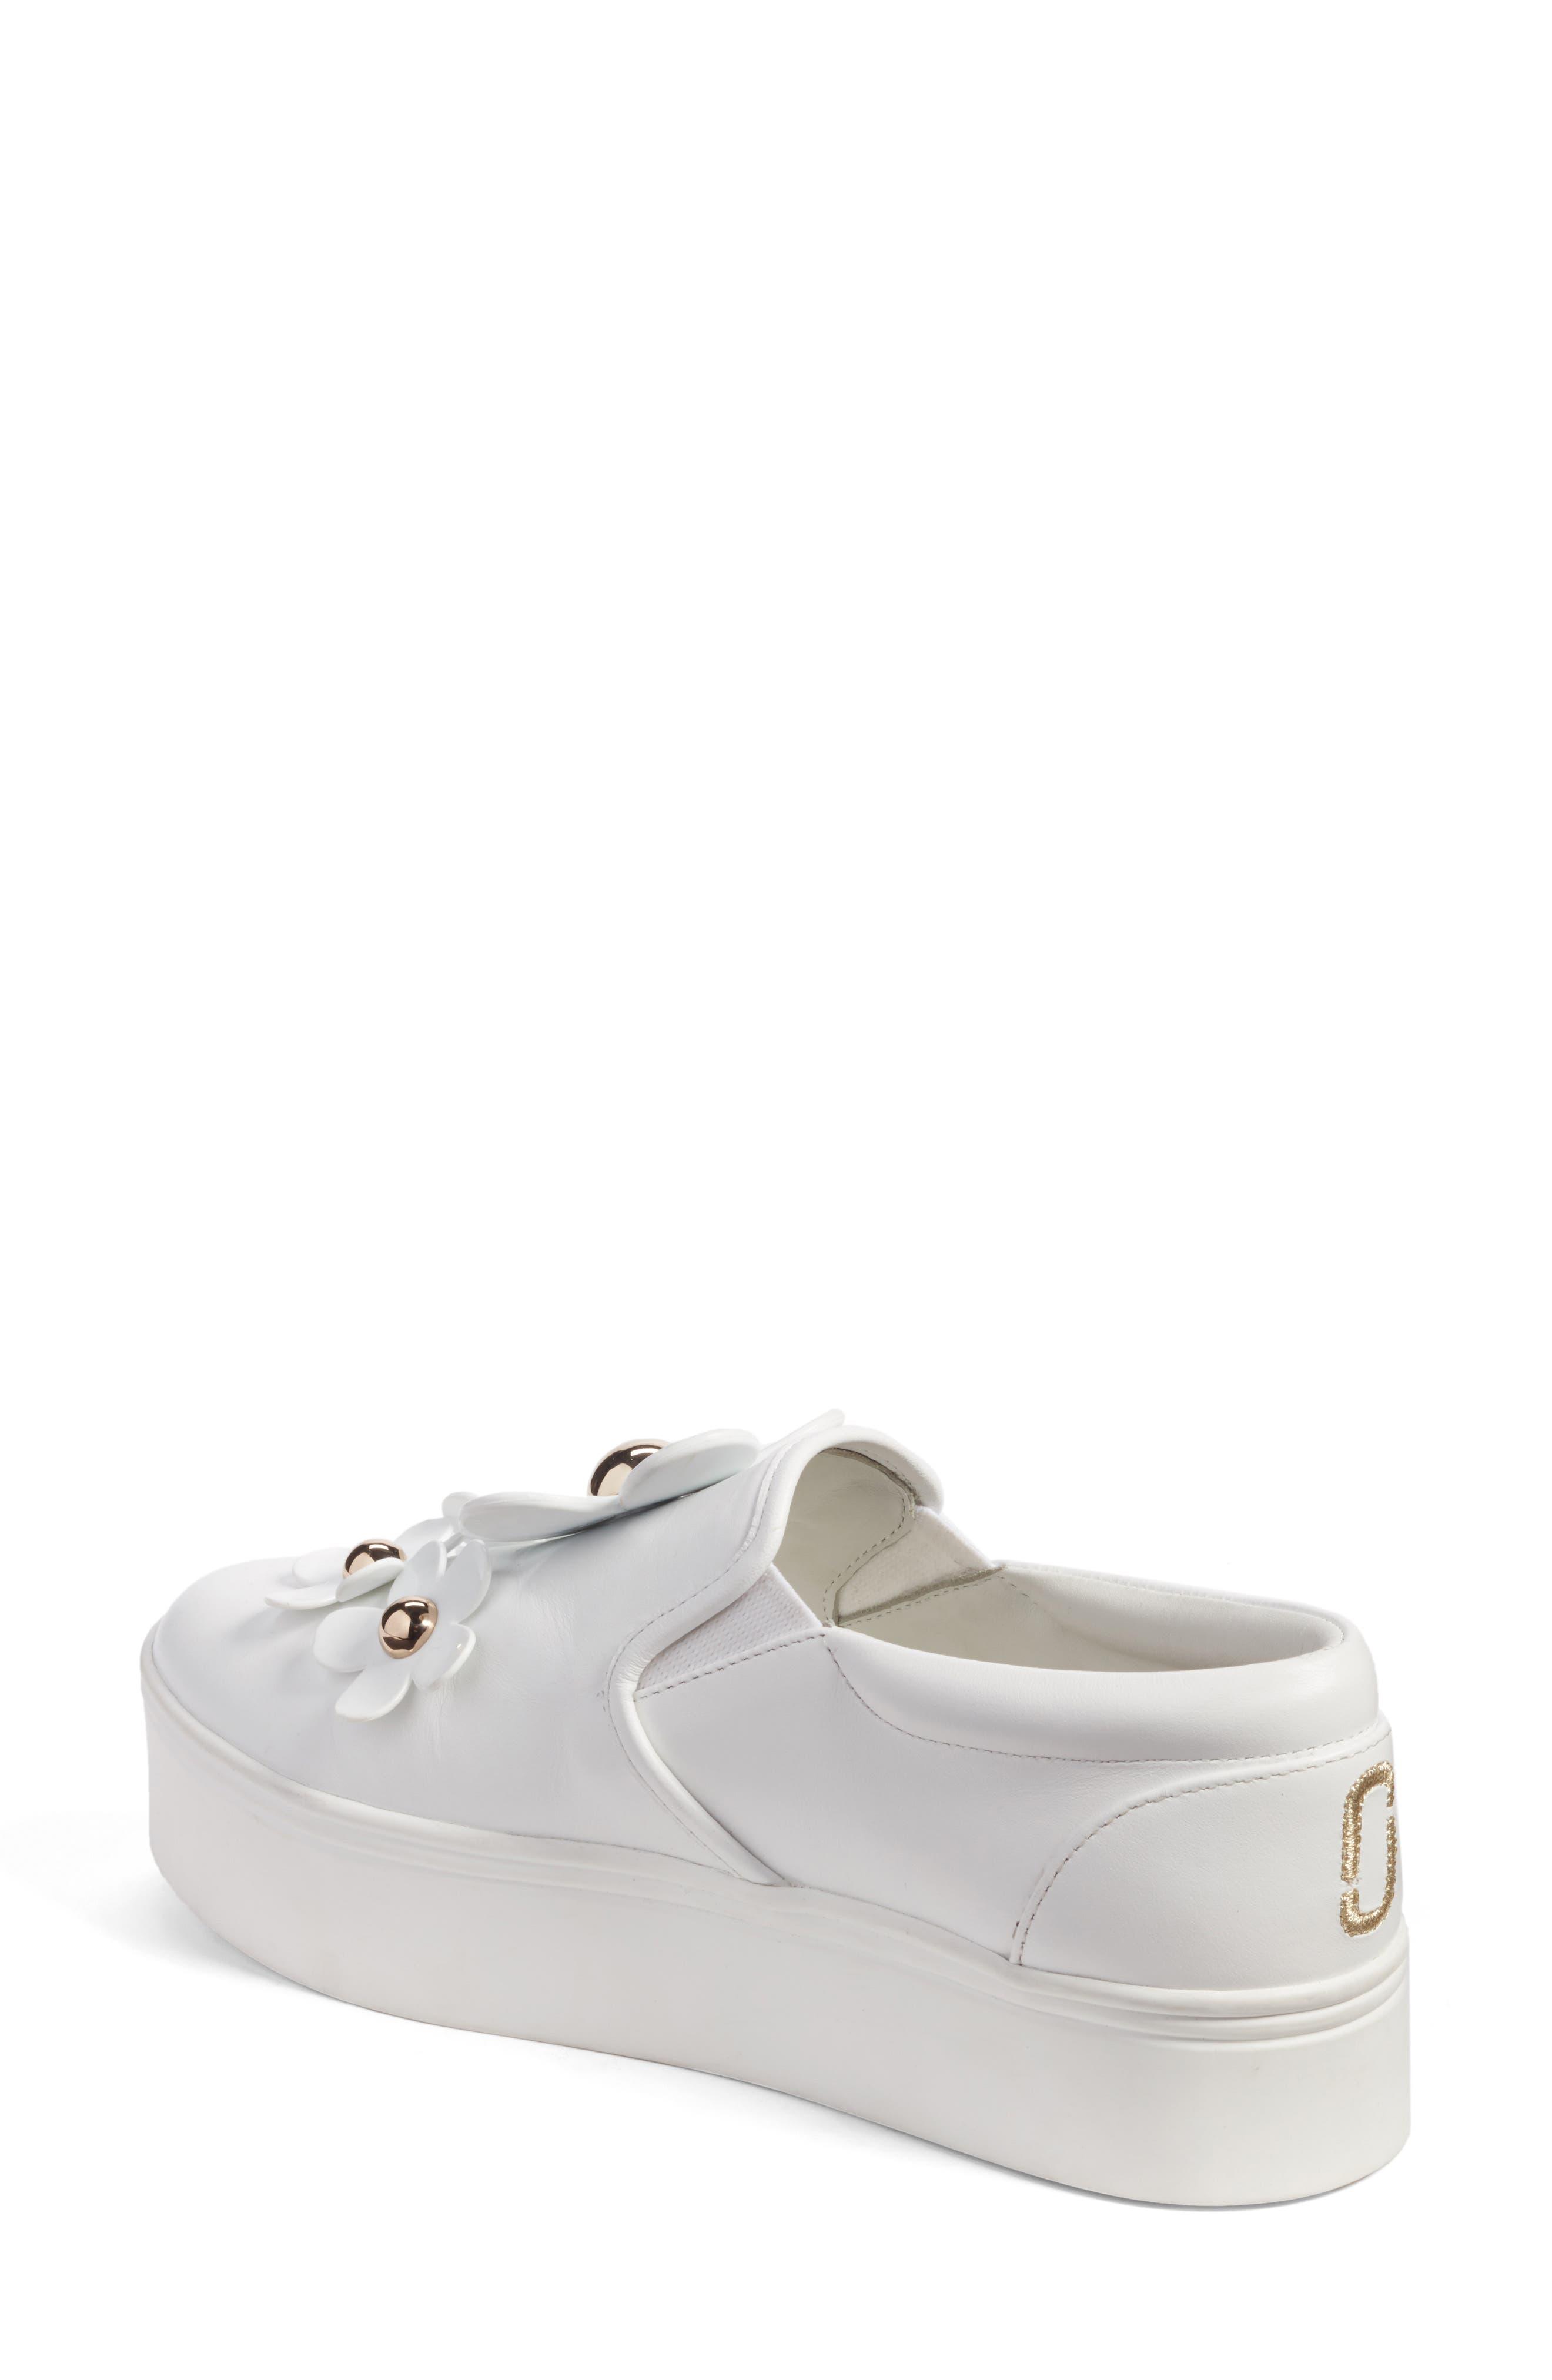 Alternate Image 2  - MARC JACOBS Platform Sneaker (Women)